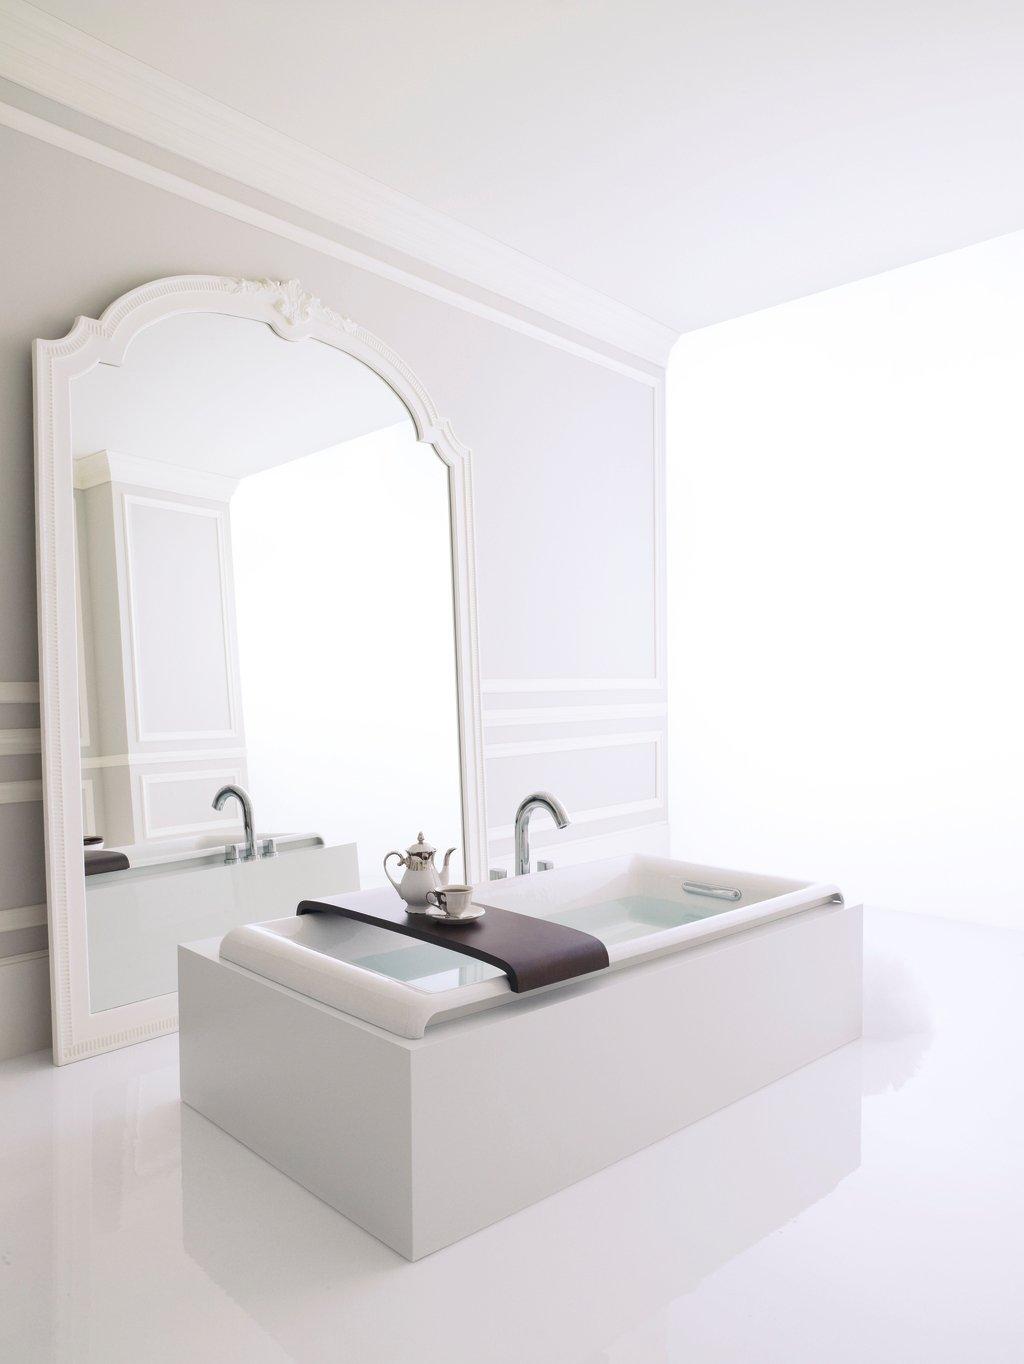 the Bath Showcase: Low Step Over Baths